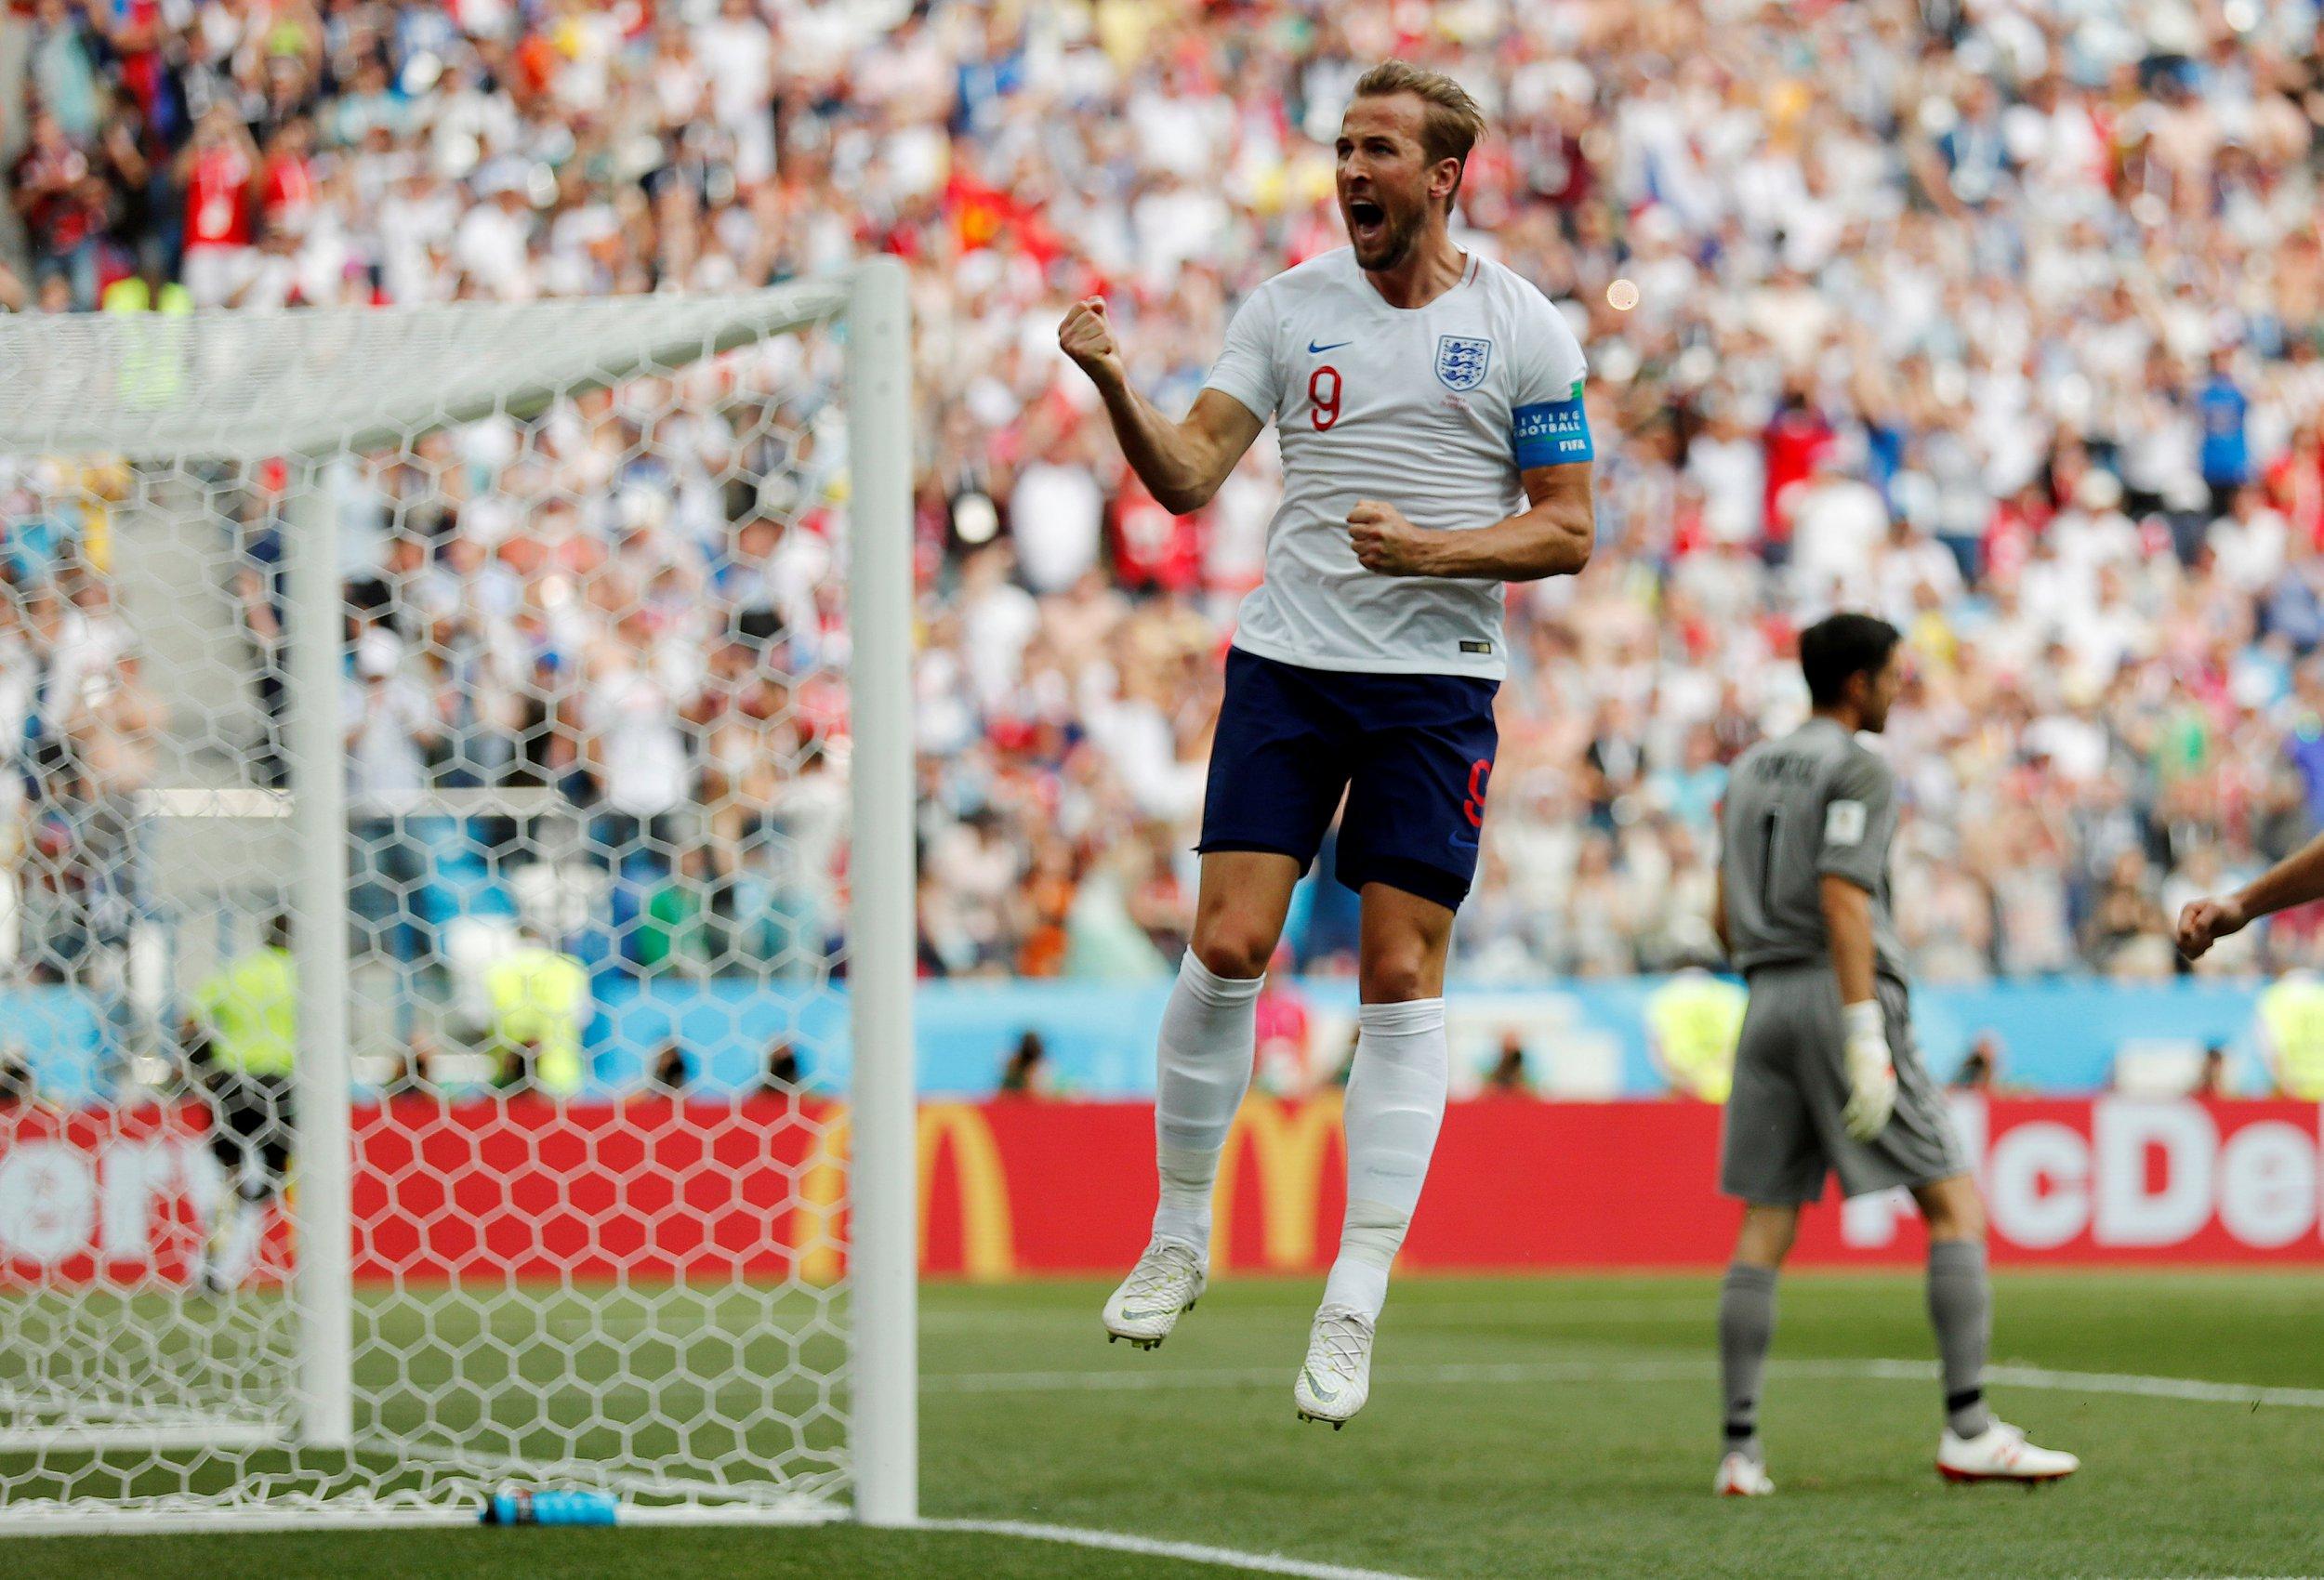 Soccer Football - World Cup - Group G - England vs Panama - Nizhny Novgorod Stadium, Nizhny Novgorod, Russia - June 24, 2018 England's Harry Kane celebrates scoring their second goal REUTERS/Carlos Barria